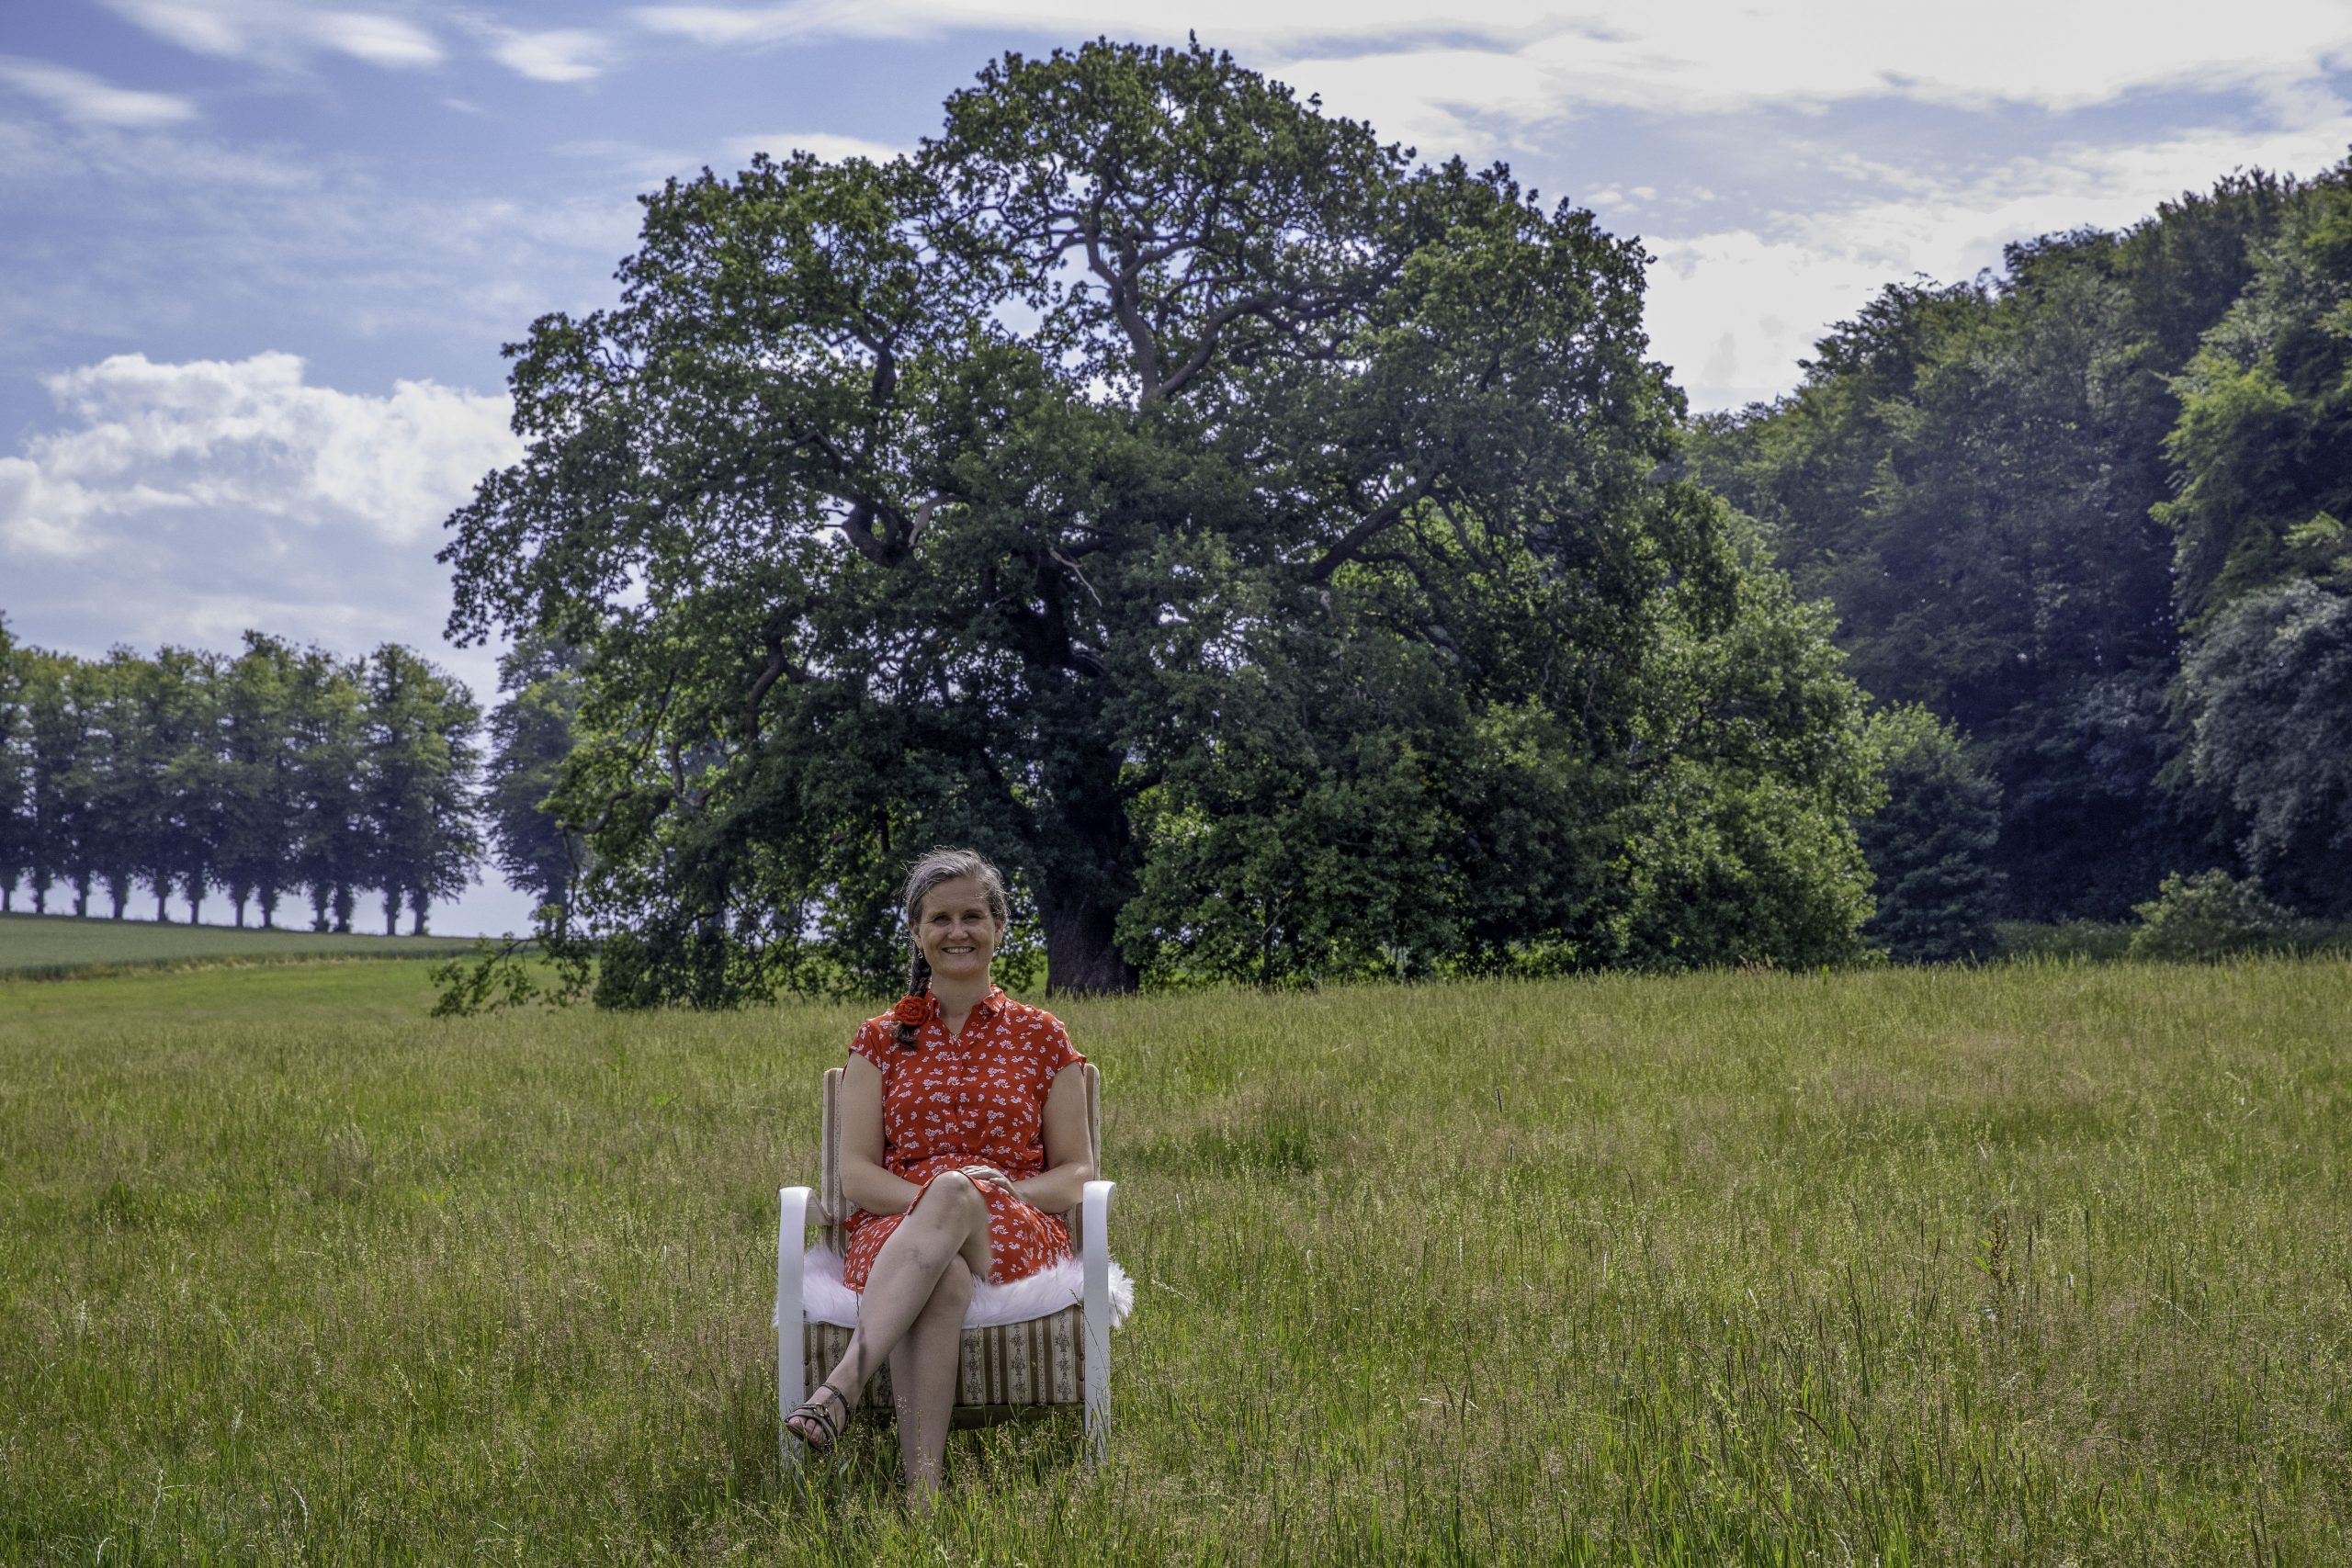 Camaniki coach: Malene sidder foran et træ